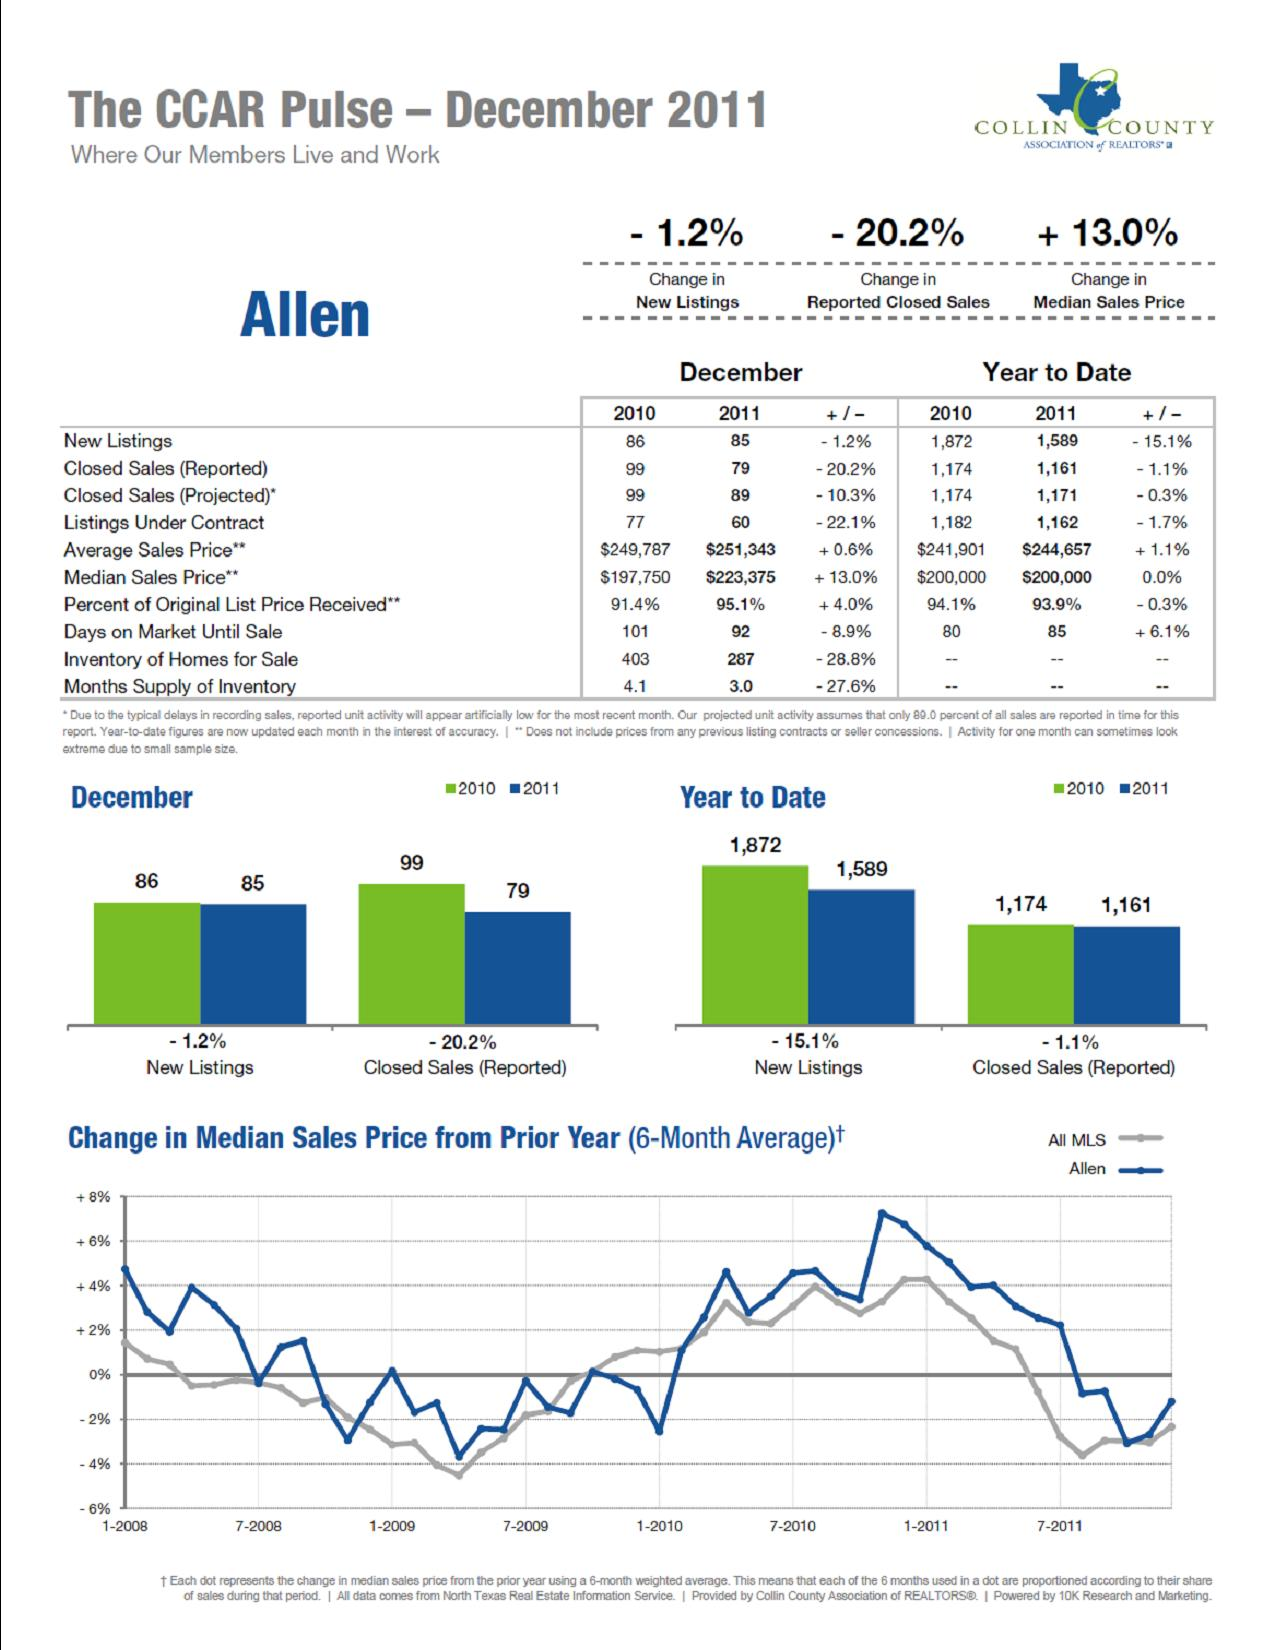 Allen - December